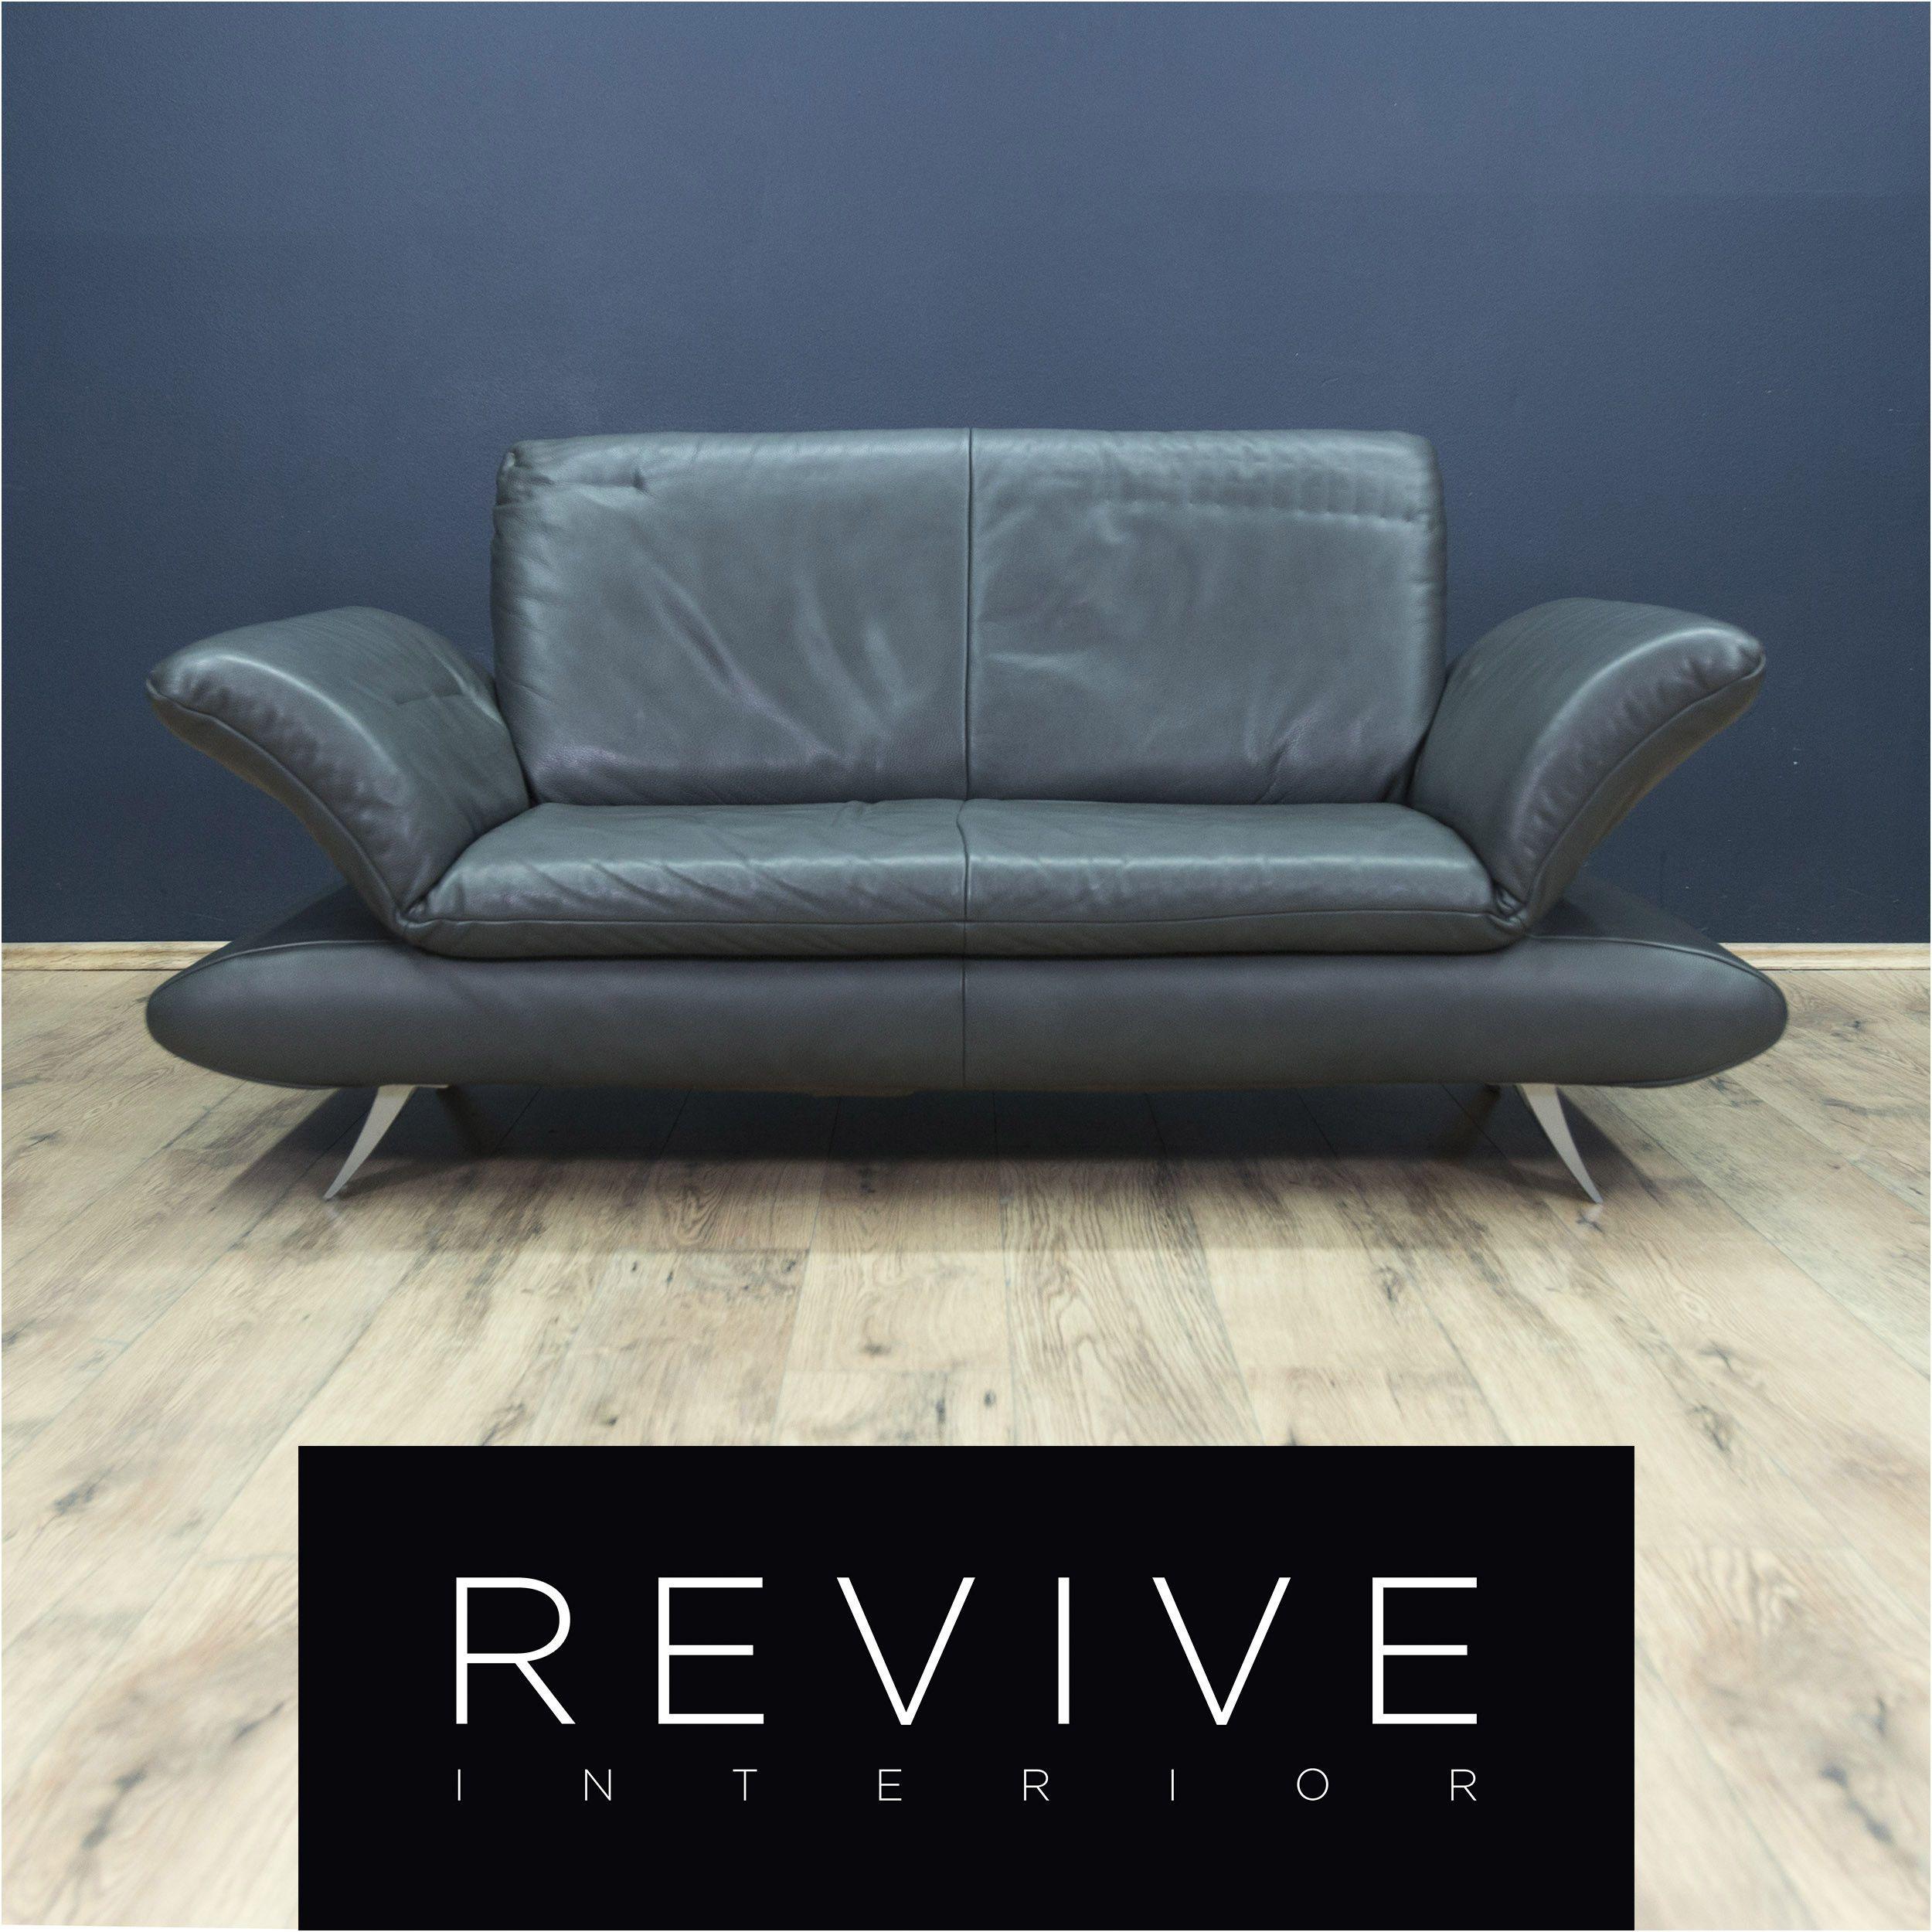 Koinor Rossini Designer Leder Sofa Grau Grun Petrol Zweisitzer Couch Modern Echteder Ledercouchgrun In 2020